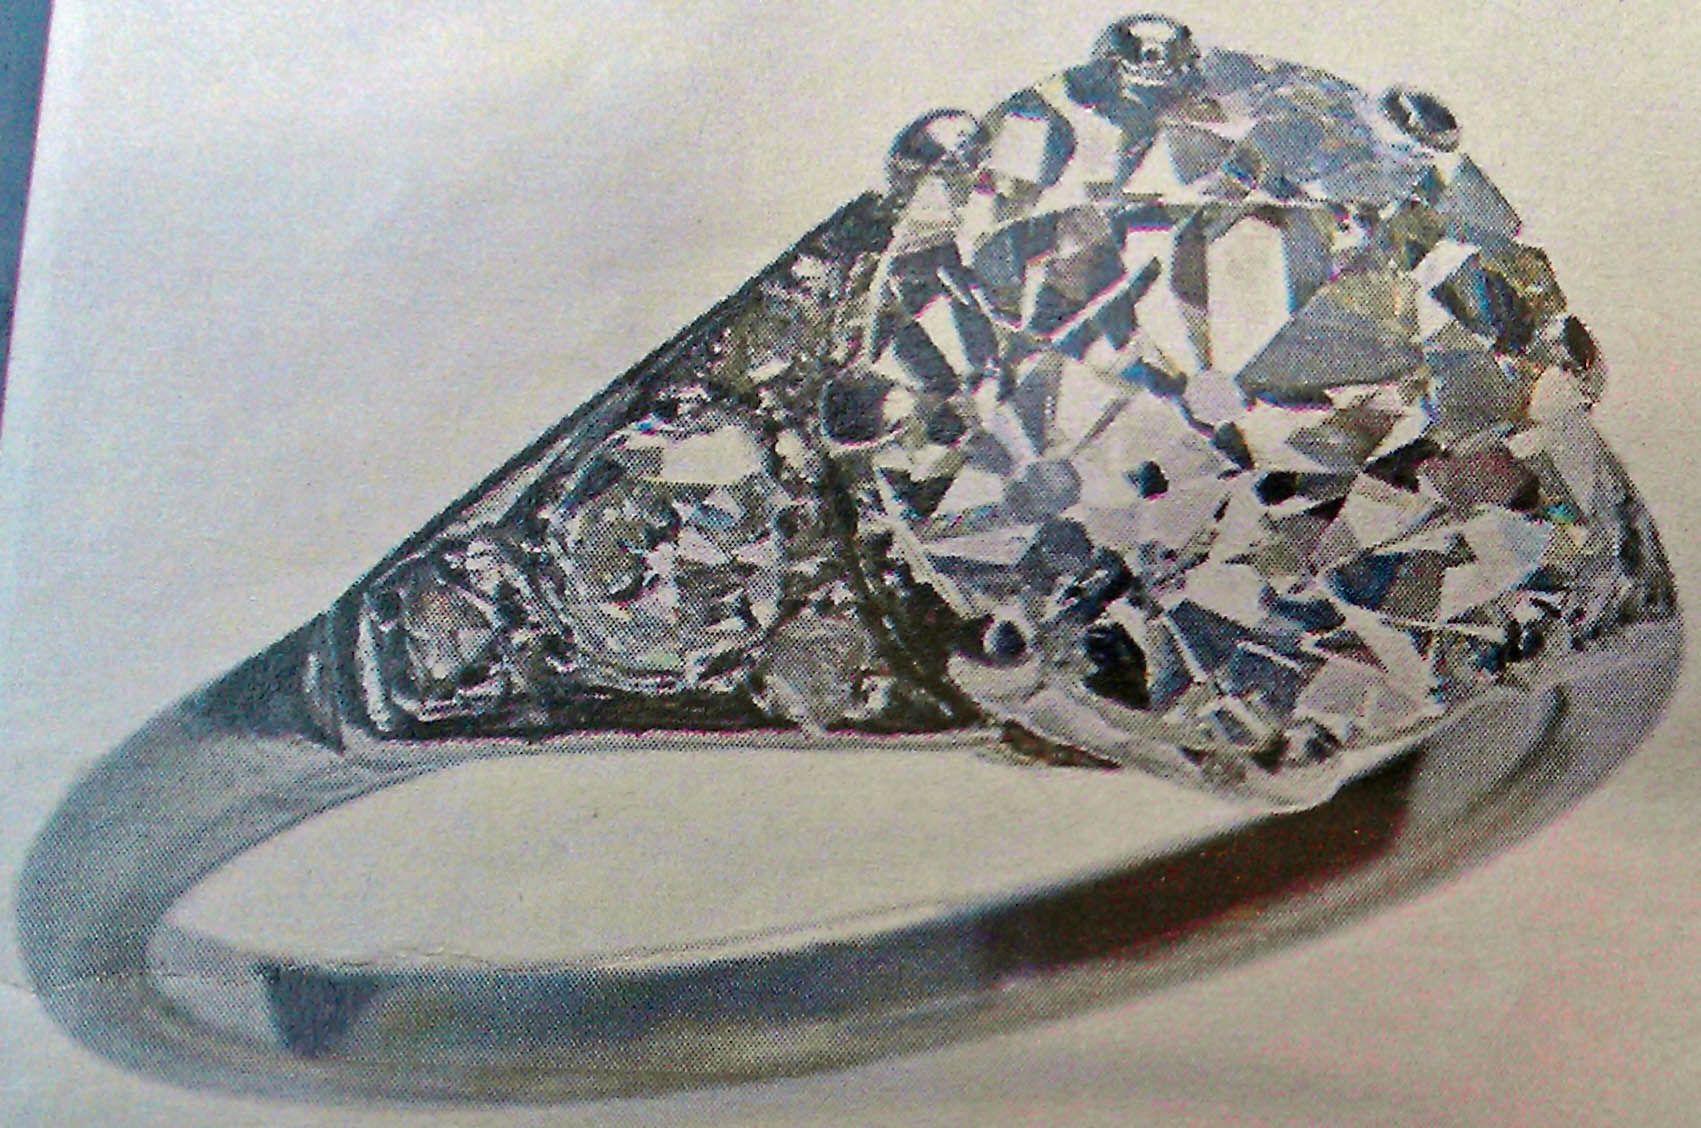 Queen Elizabeth Diamond Engagement Ring